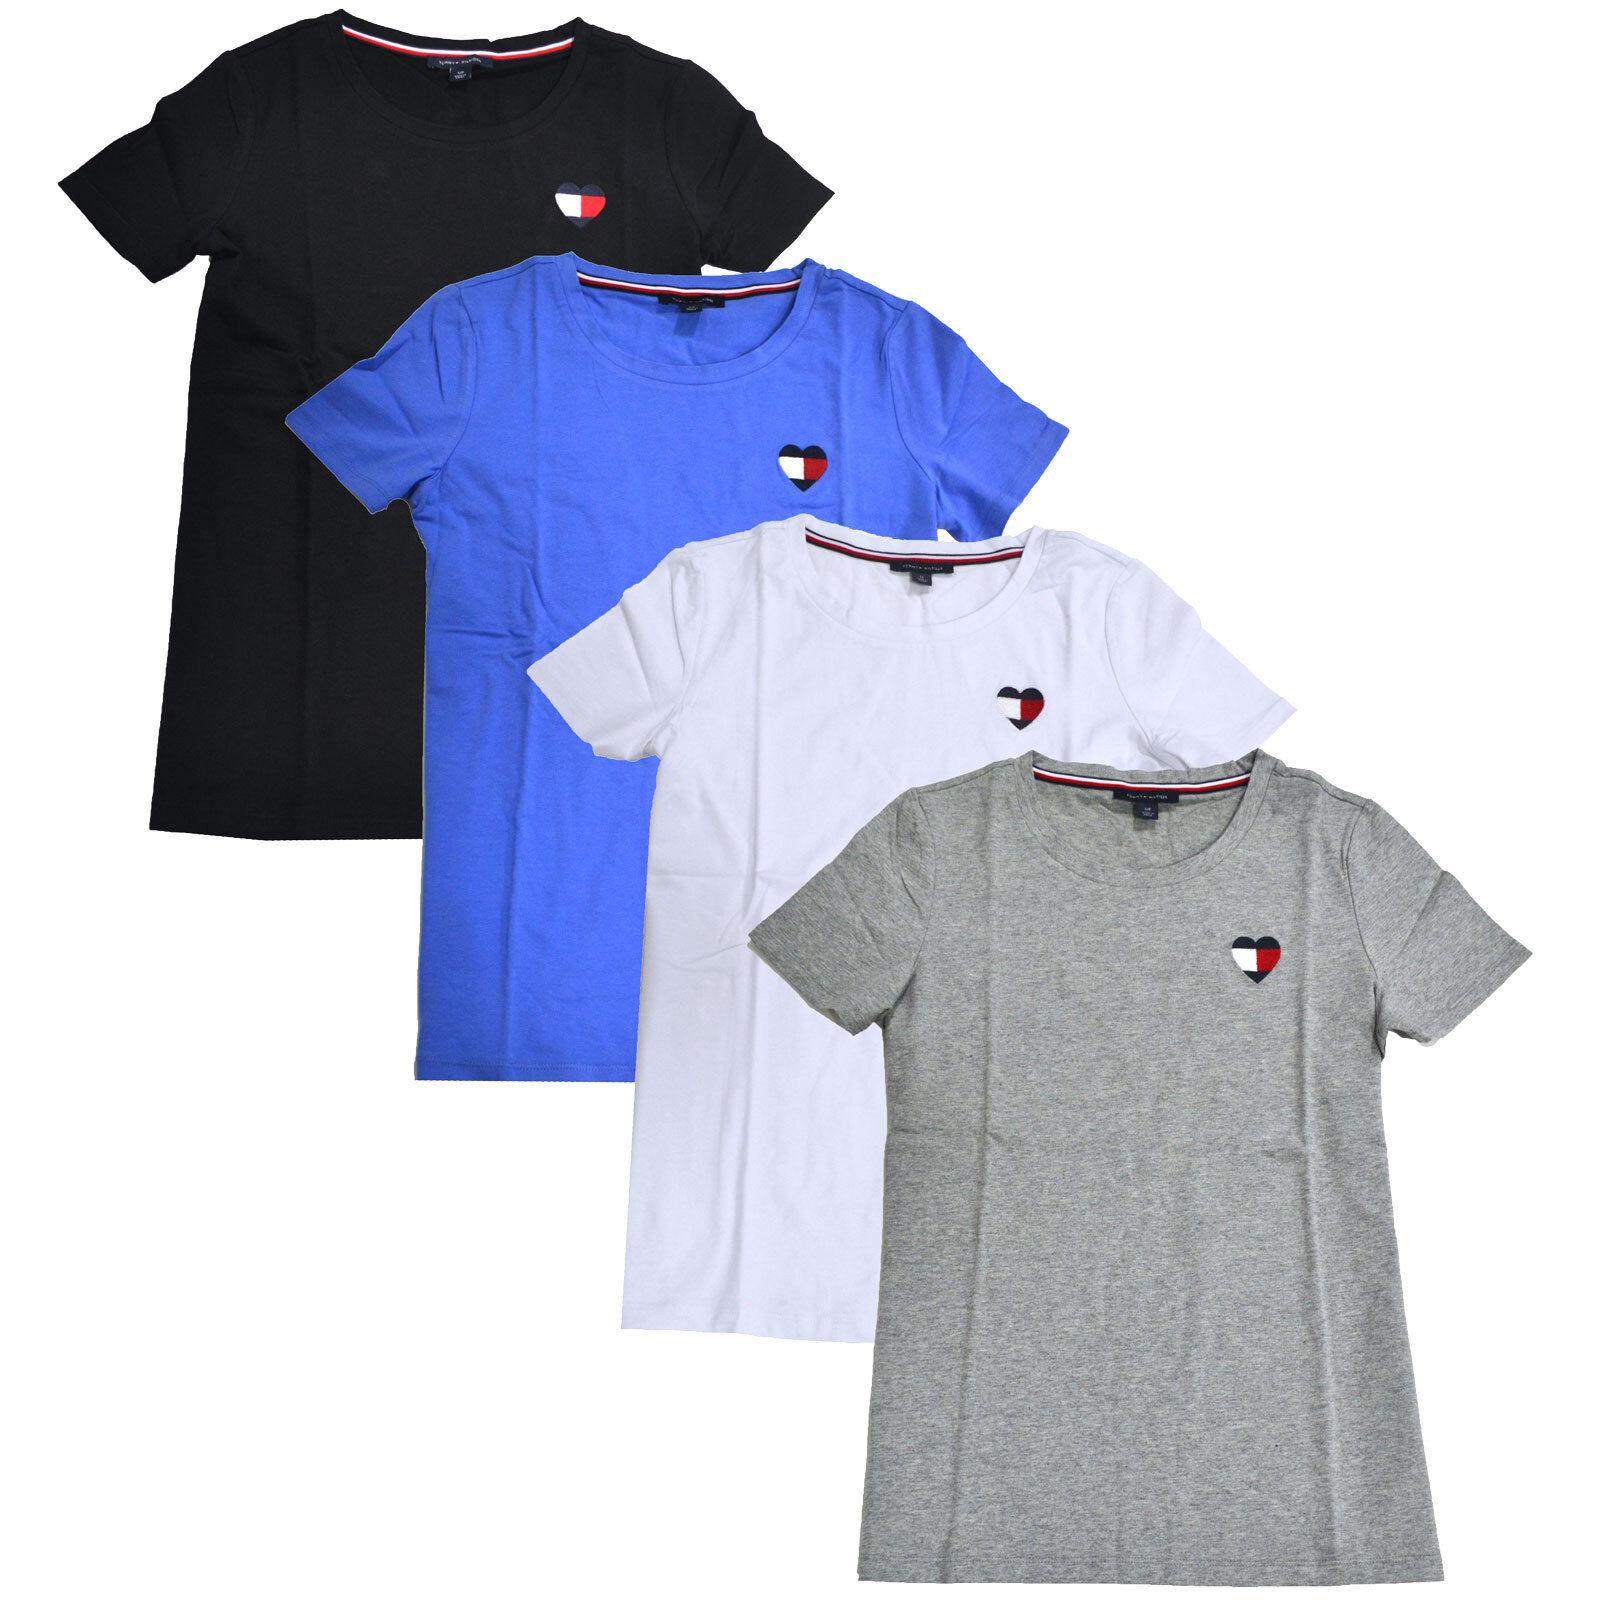 2ec95157fabc Buy Tommy Hilfiger Womens 1478 White JEWEL Neck Short Sleeve Top L B B  online